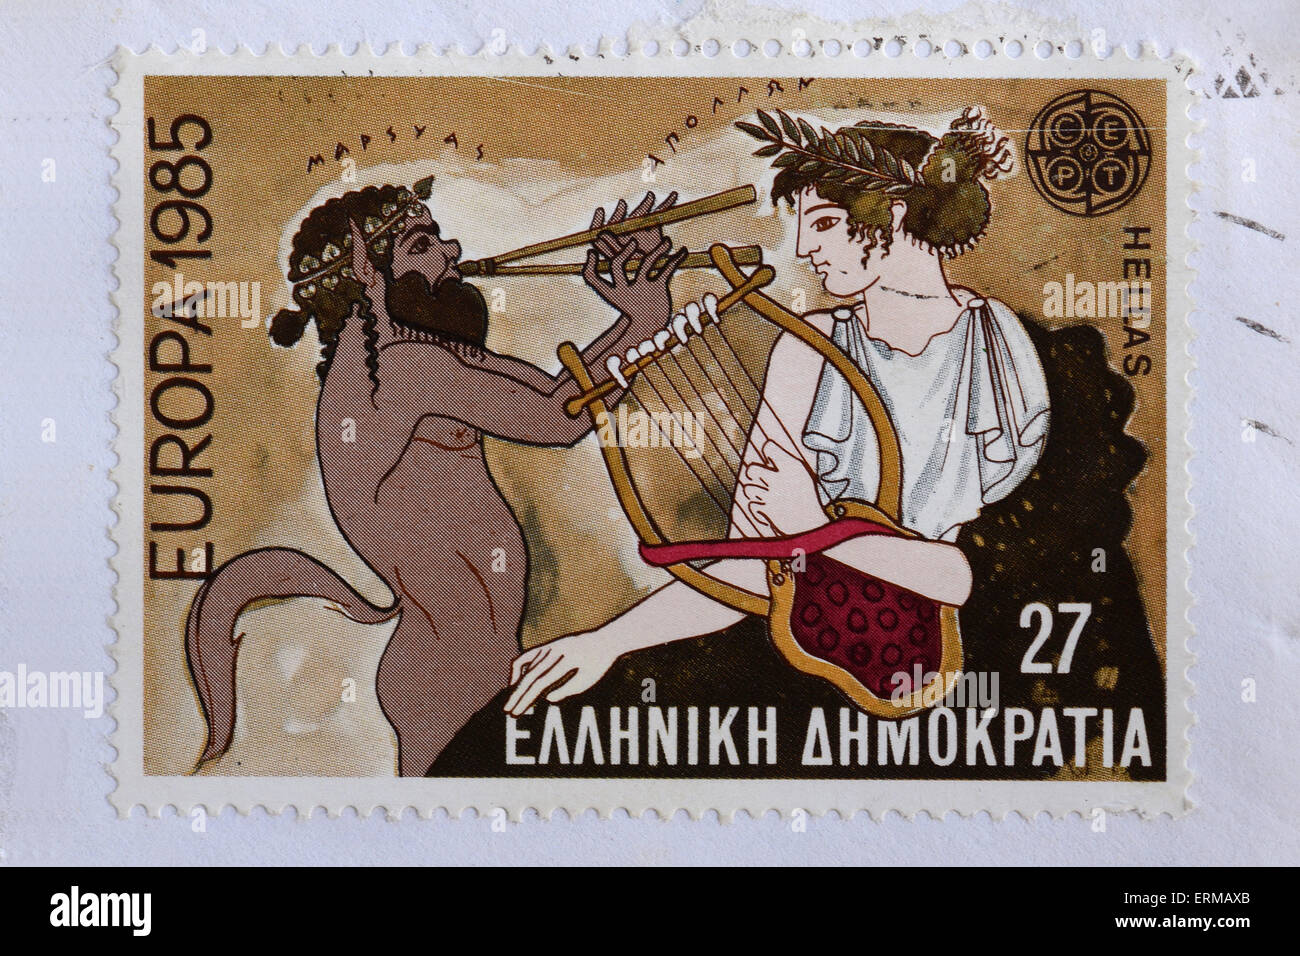 Vintage postage stamp shows Marsyas greek mythology satyr